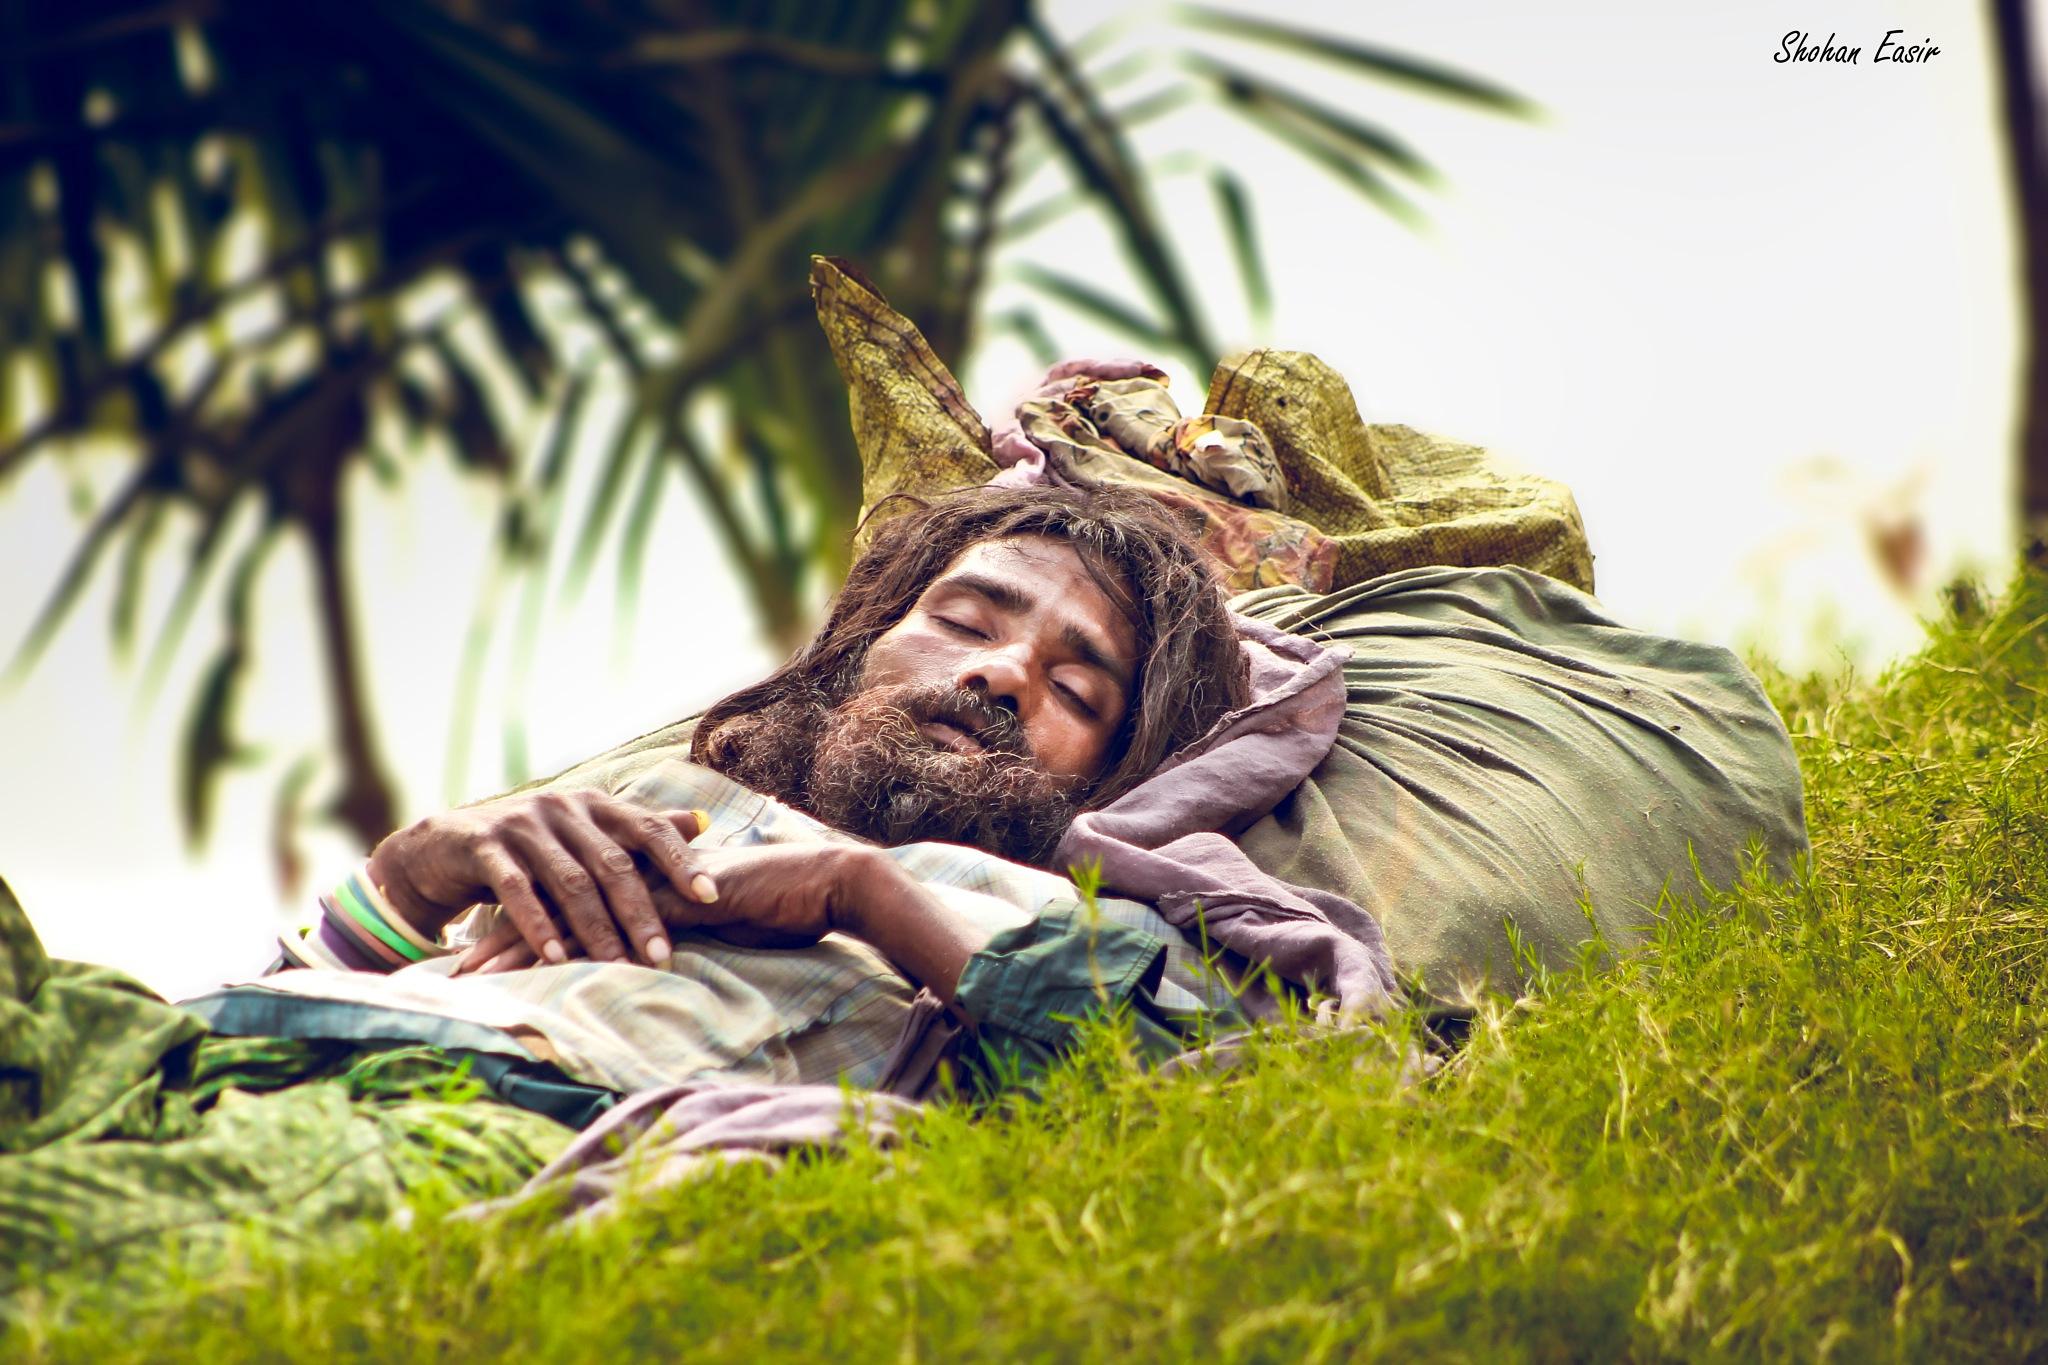 Sound Sleeping............ by ShohanEasir